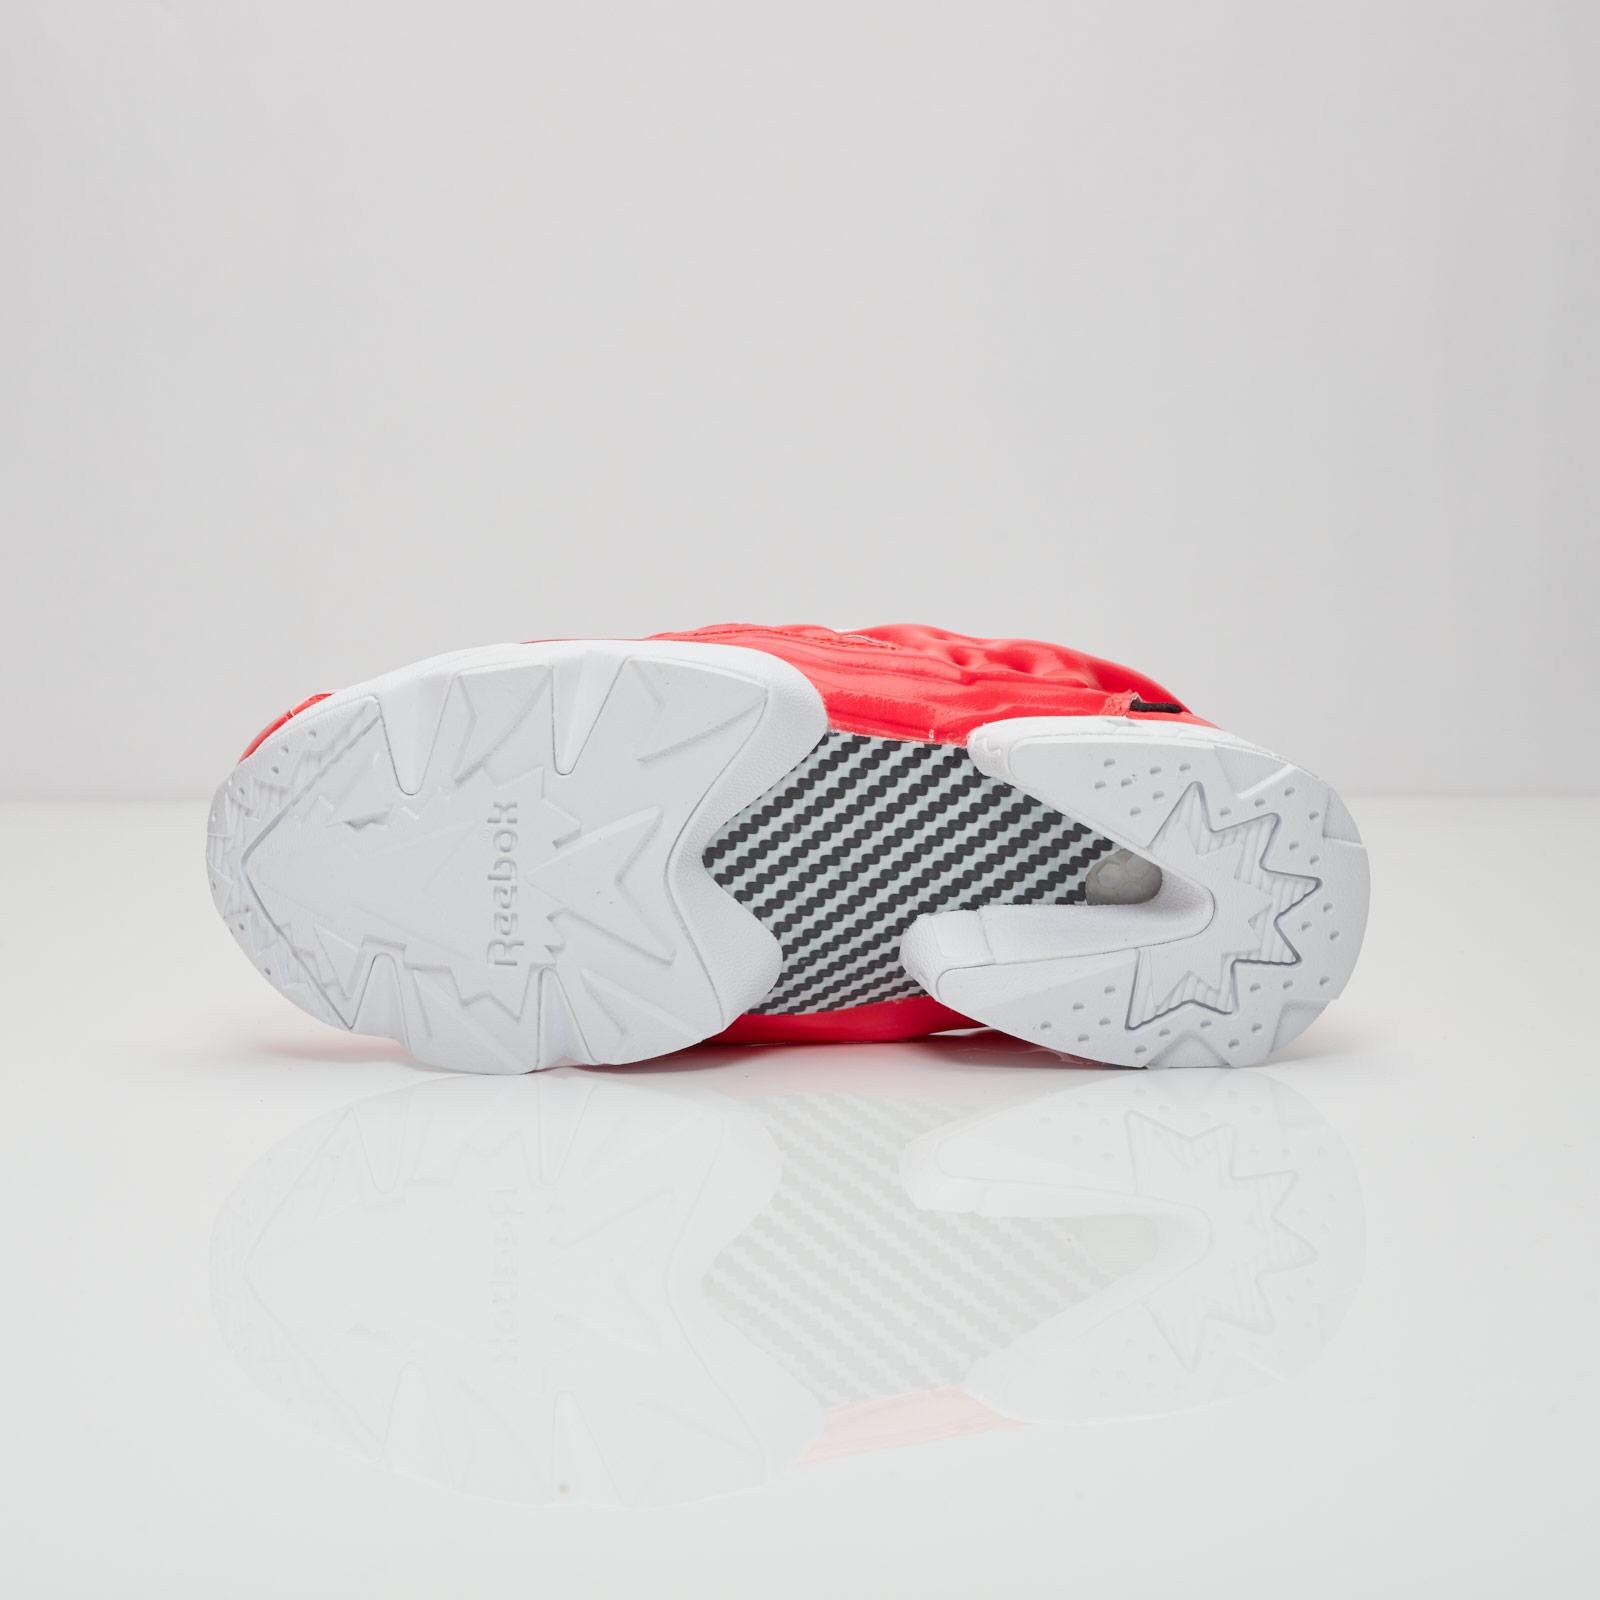 13ee97e8a12 Reebok Instapump Fury OB - Ar1607 - Sneakersnstuff